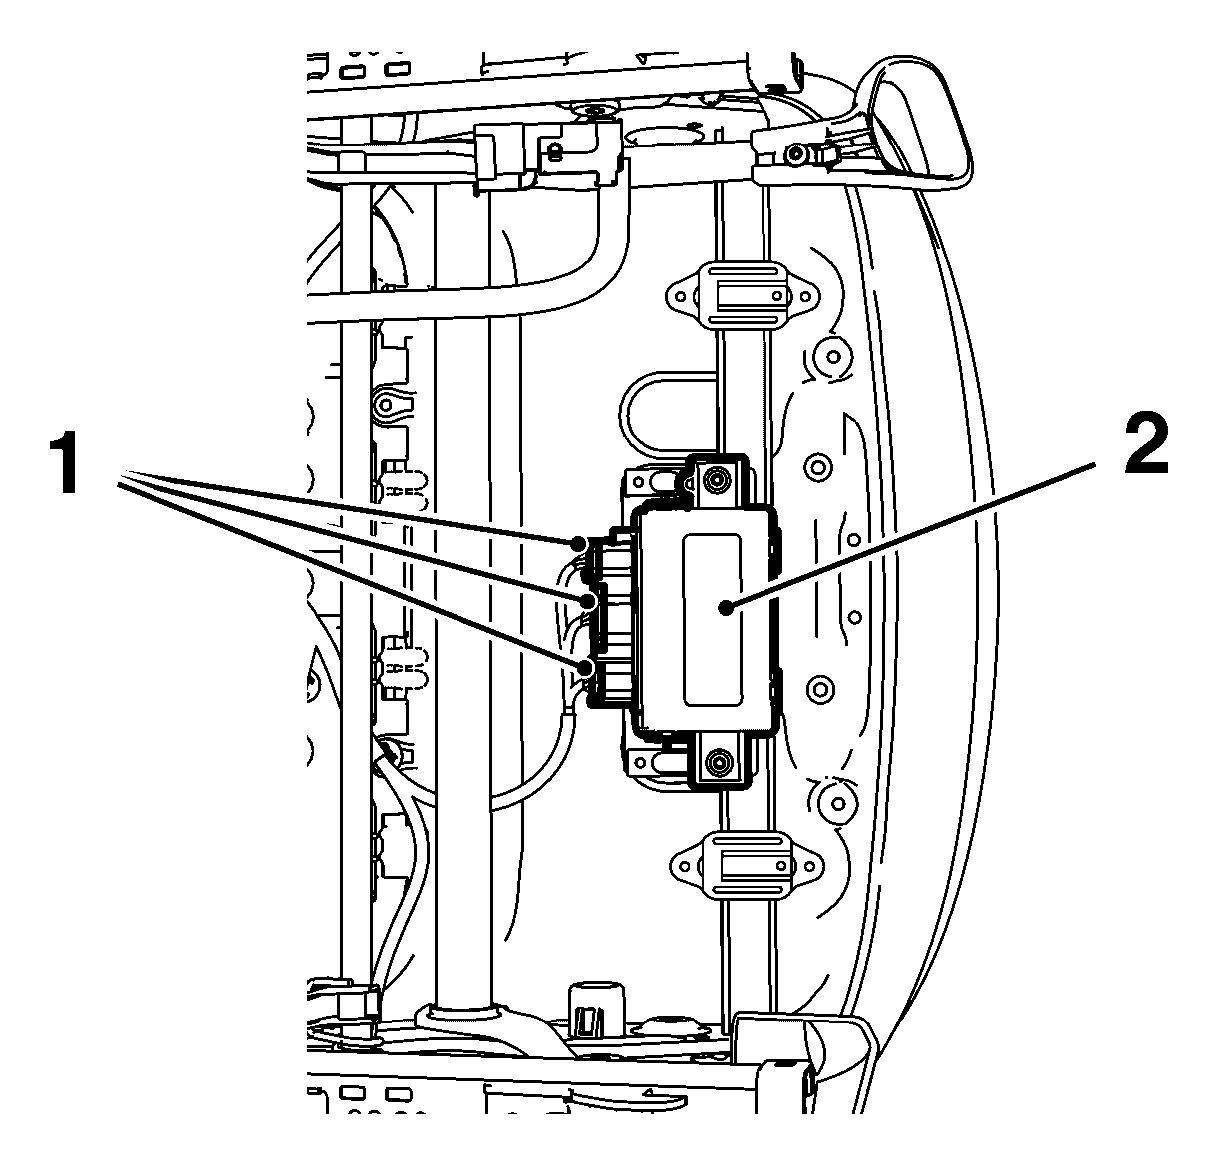 opel insignia 2010 wiring diagram